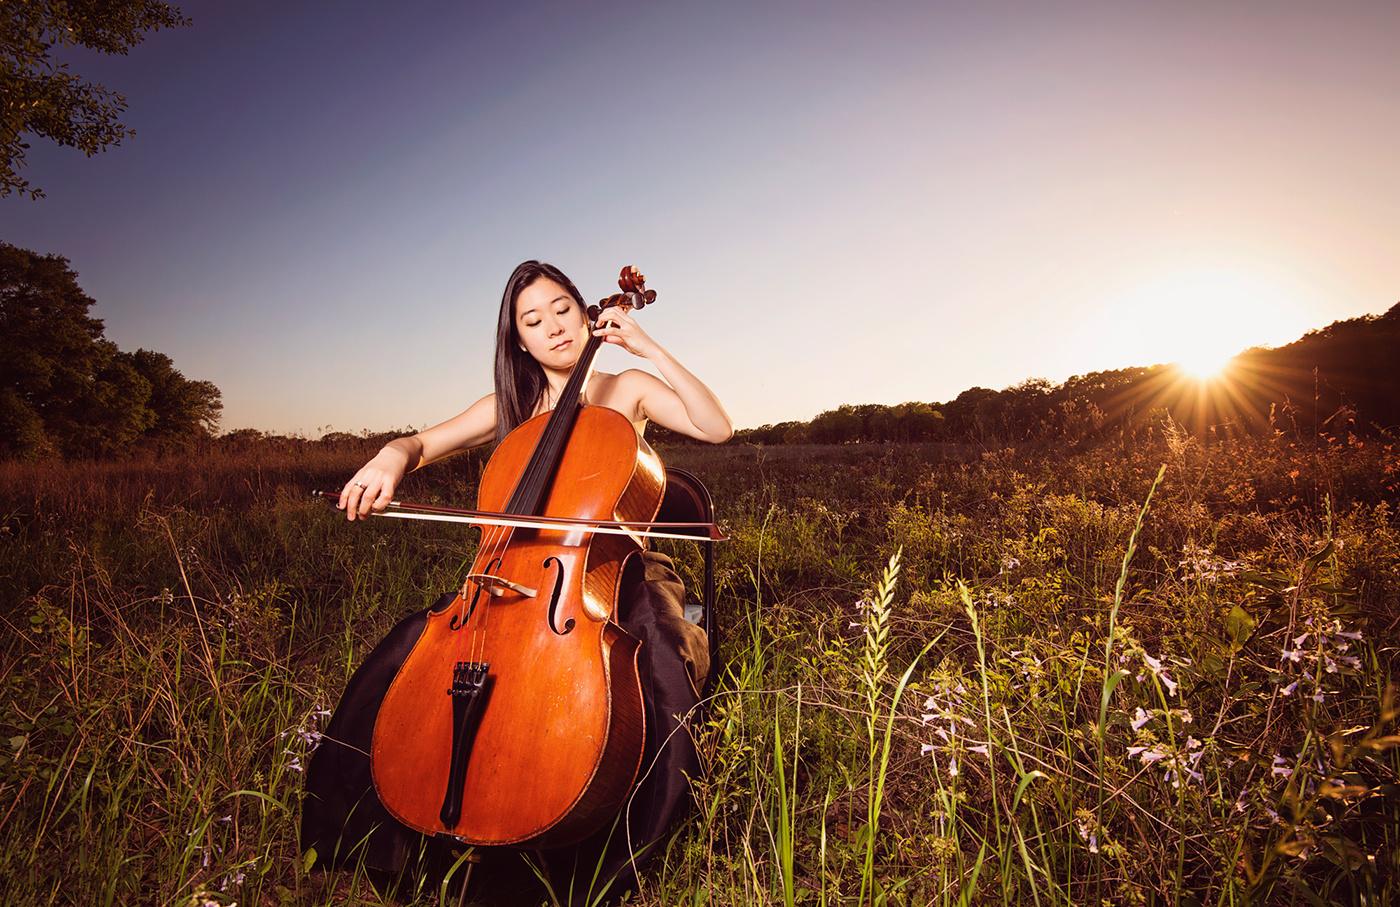 Sunset Cello - Brazos Park by Hussain Hijazi